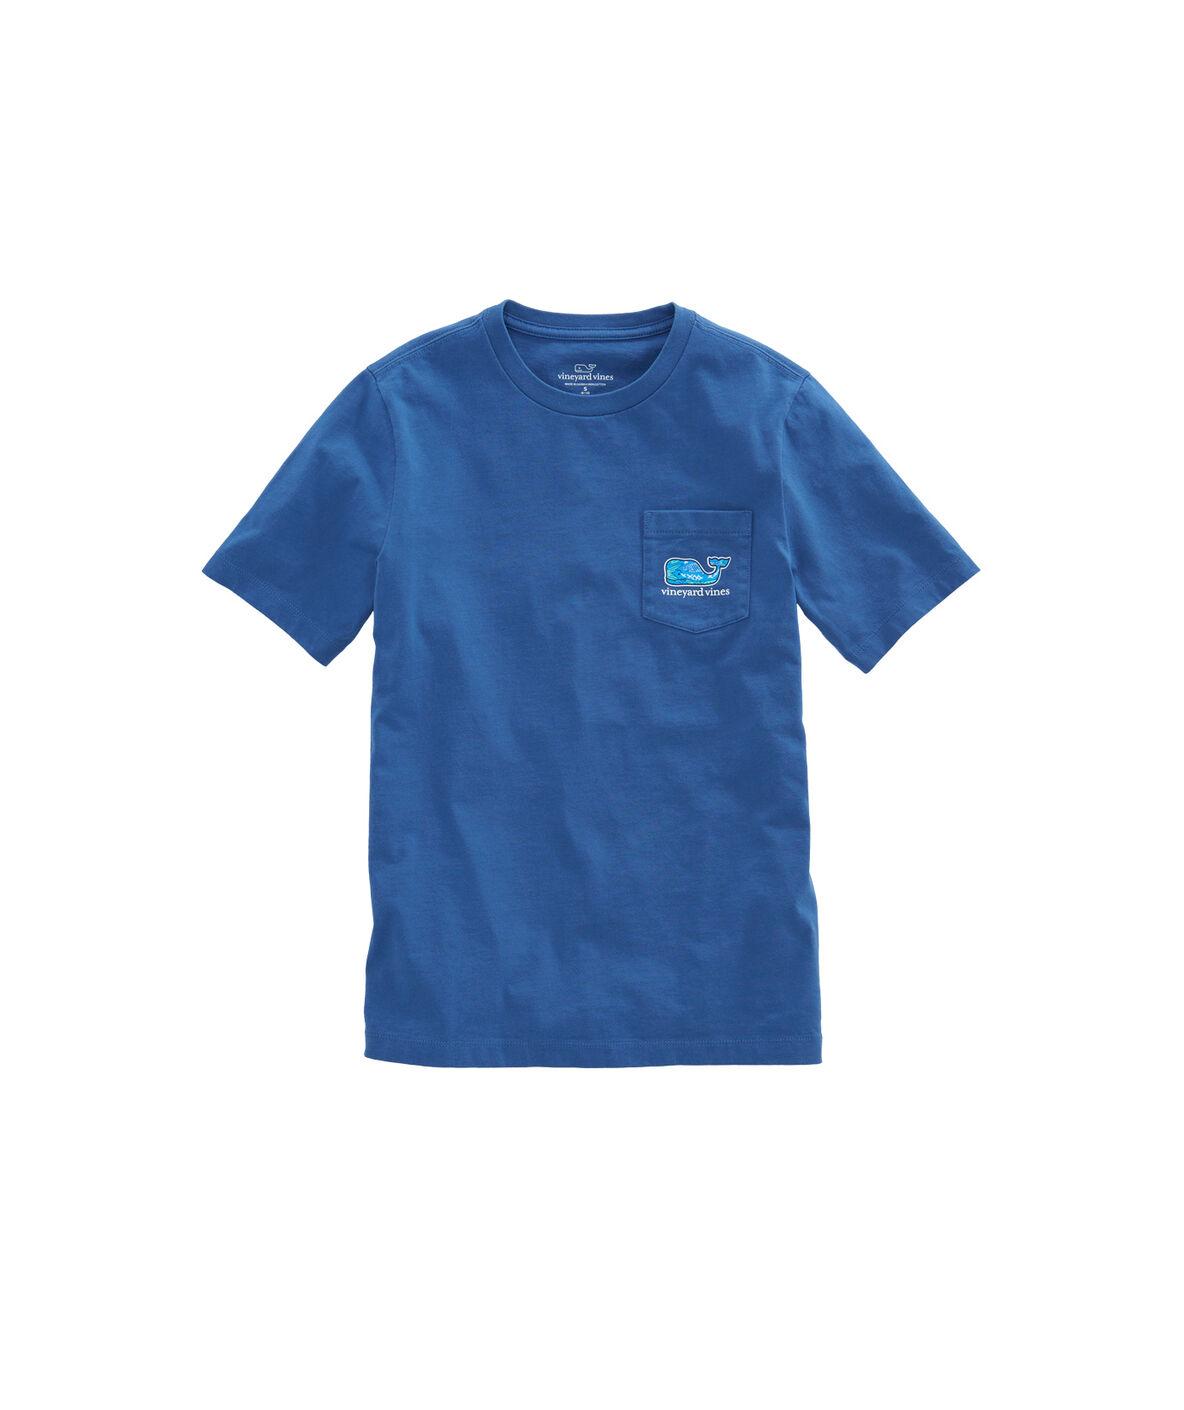 Shop boys fish scales fill pocket t shirt at vineyard vines for Fish scale shirt